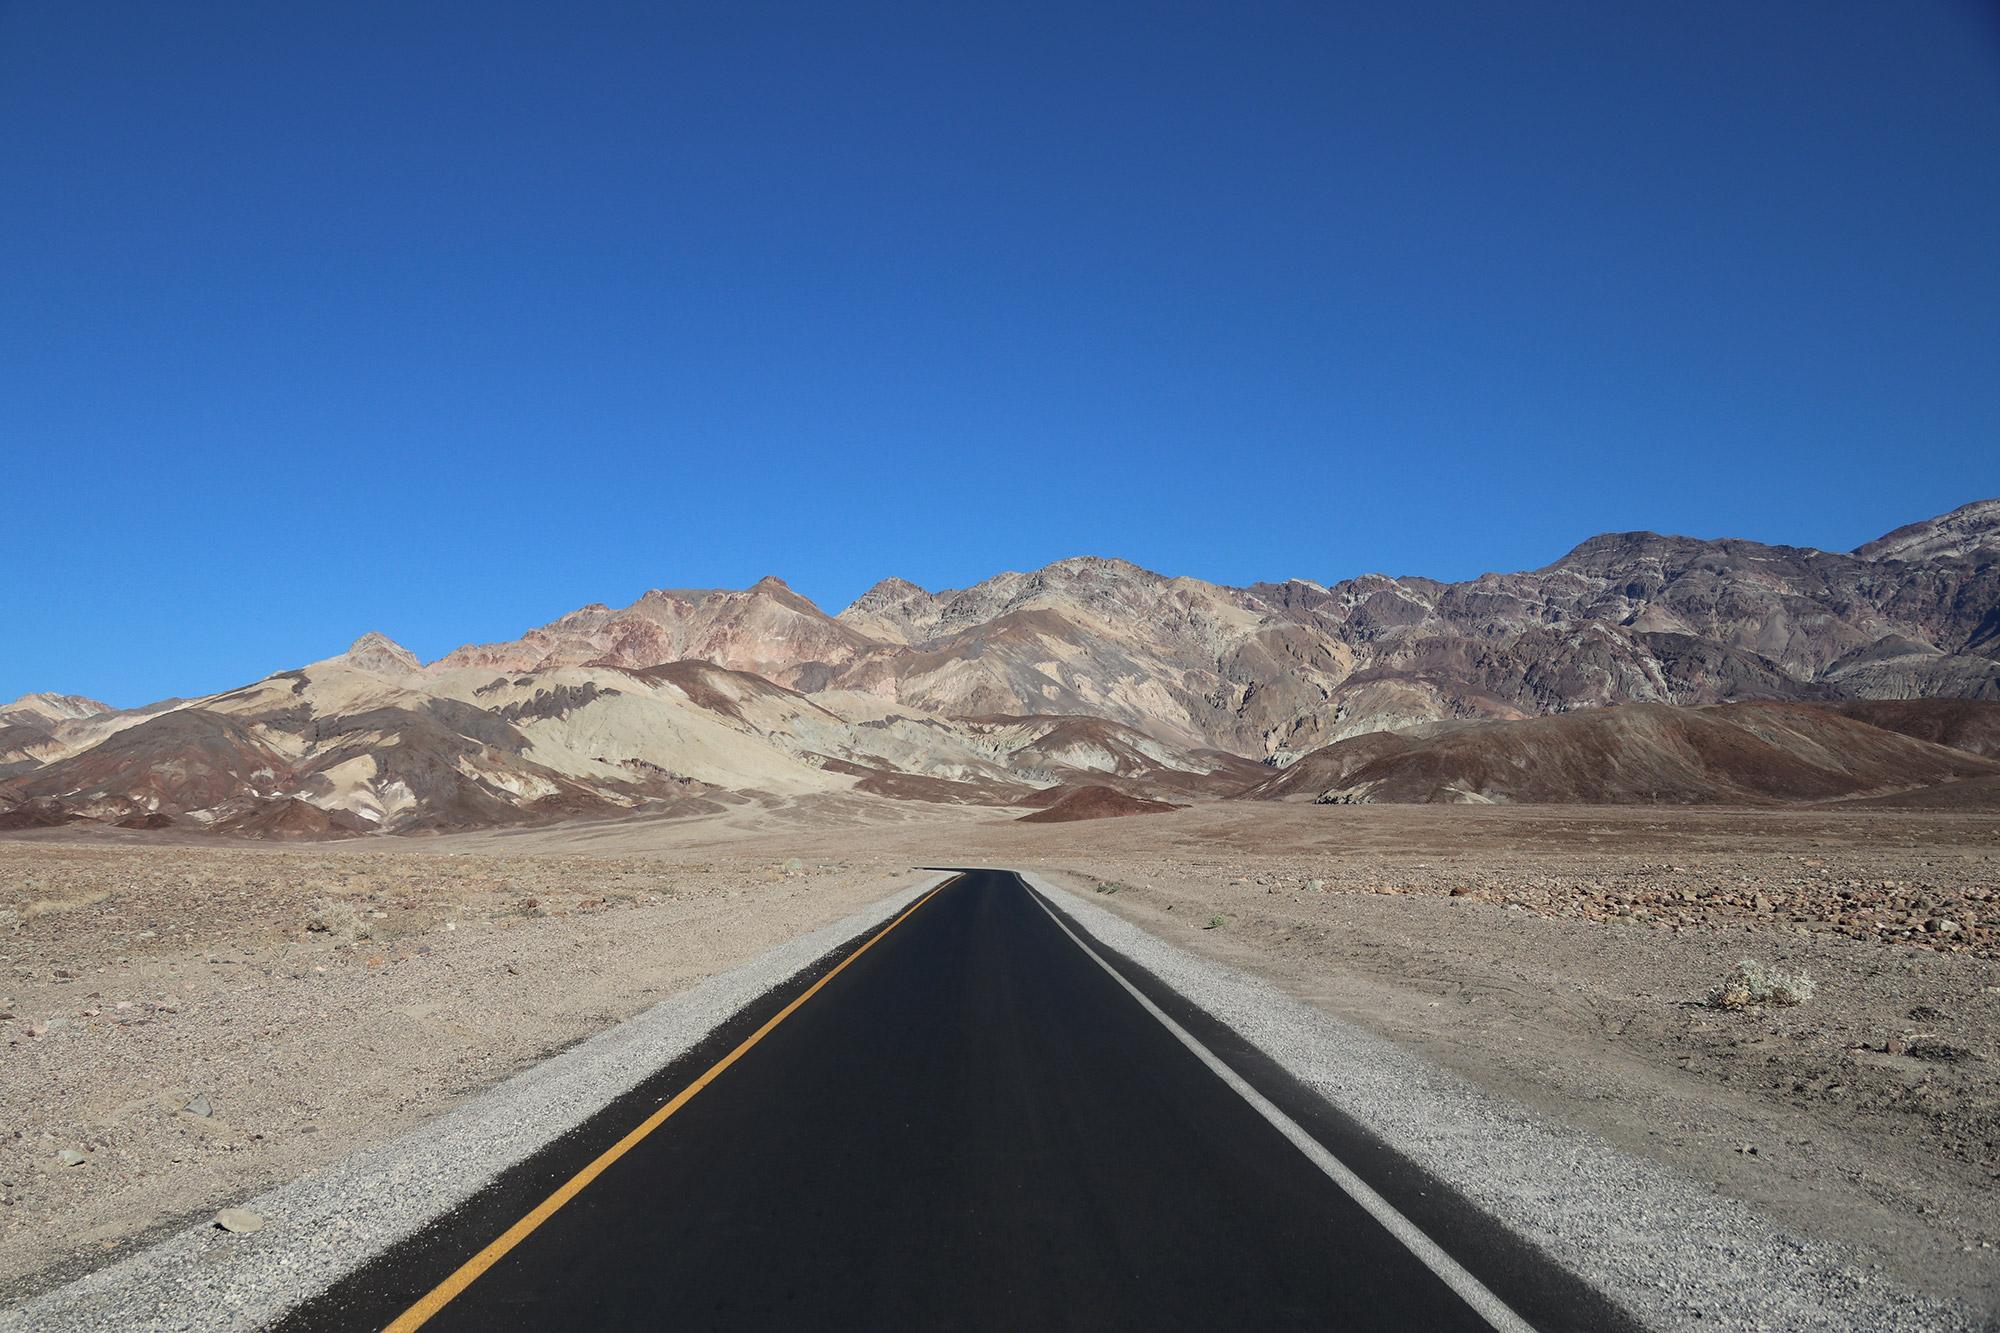 Amerika dag 18 - Death Valley National Park - Artists Drive